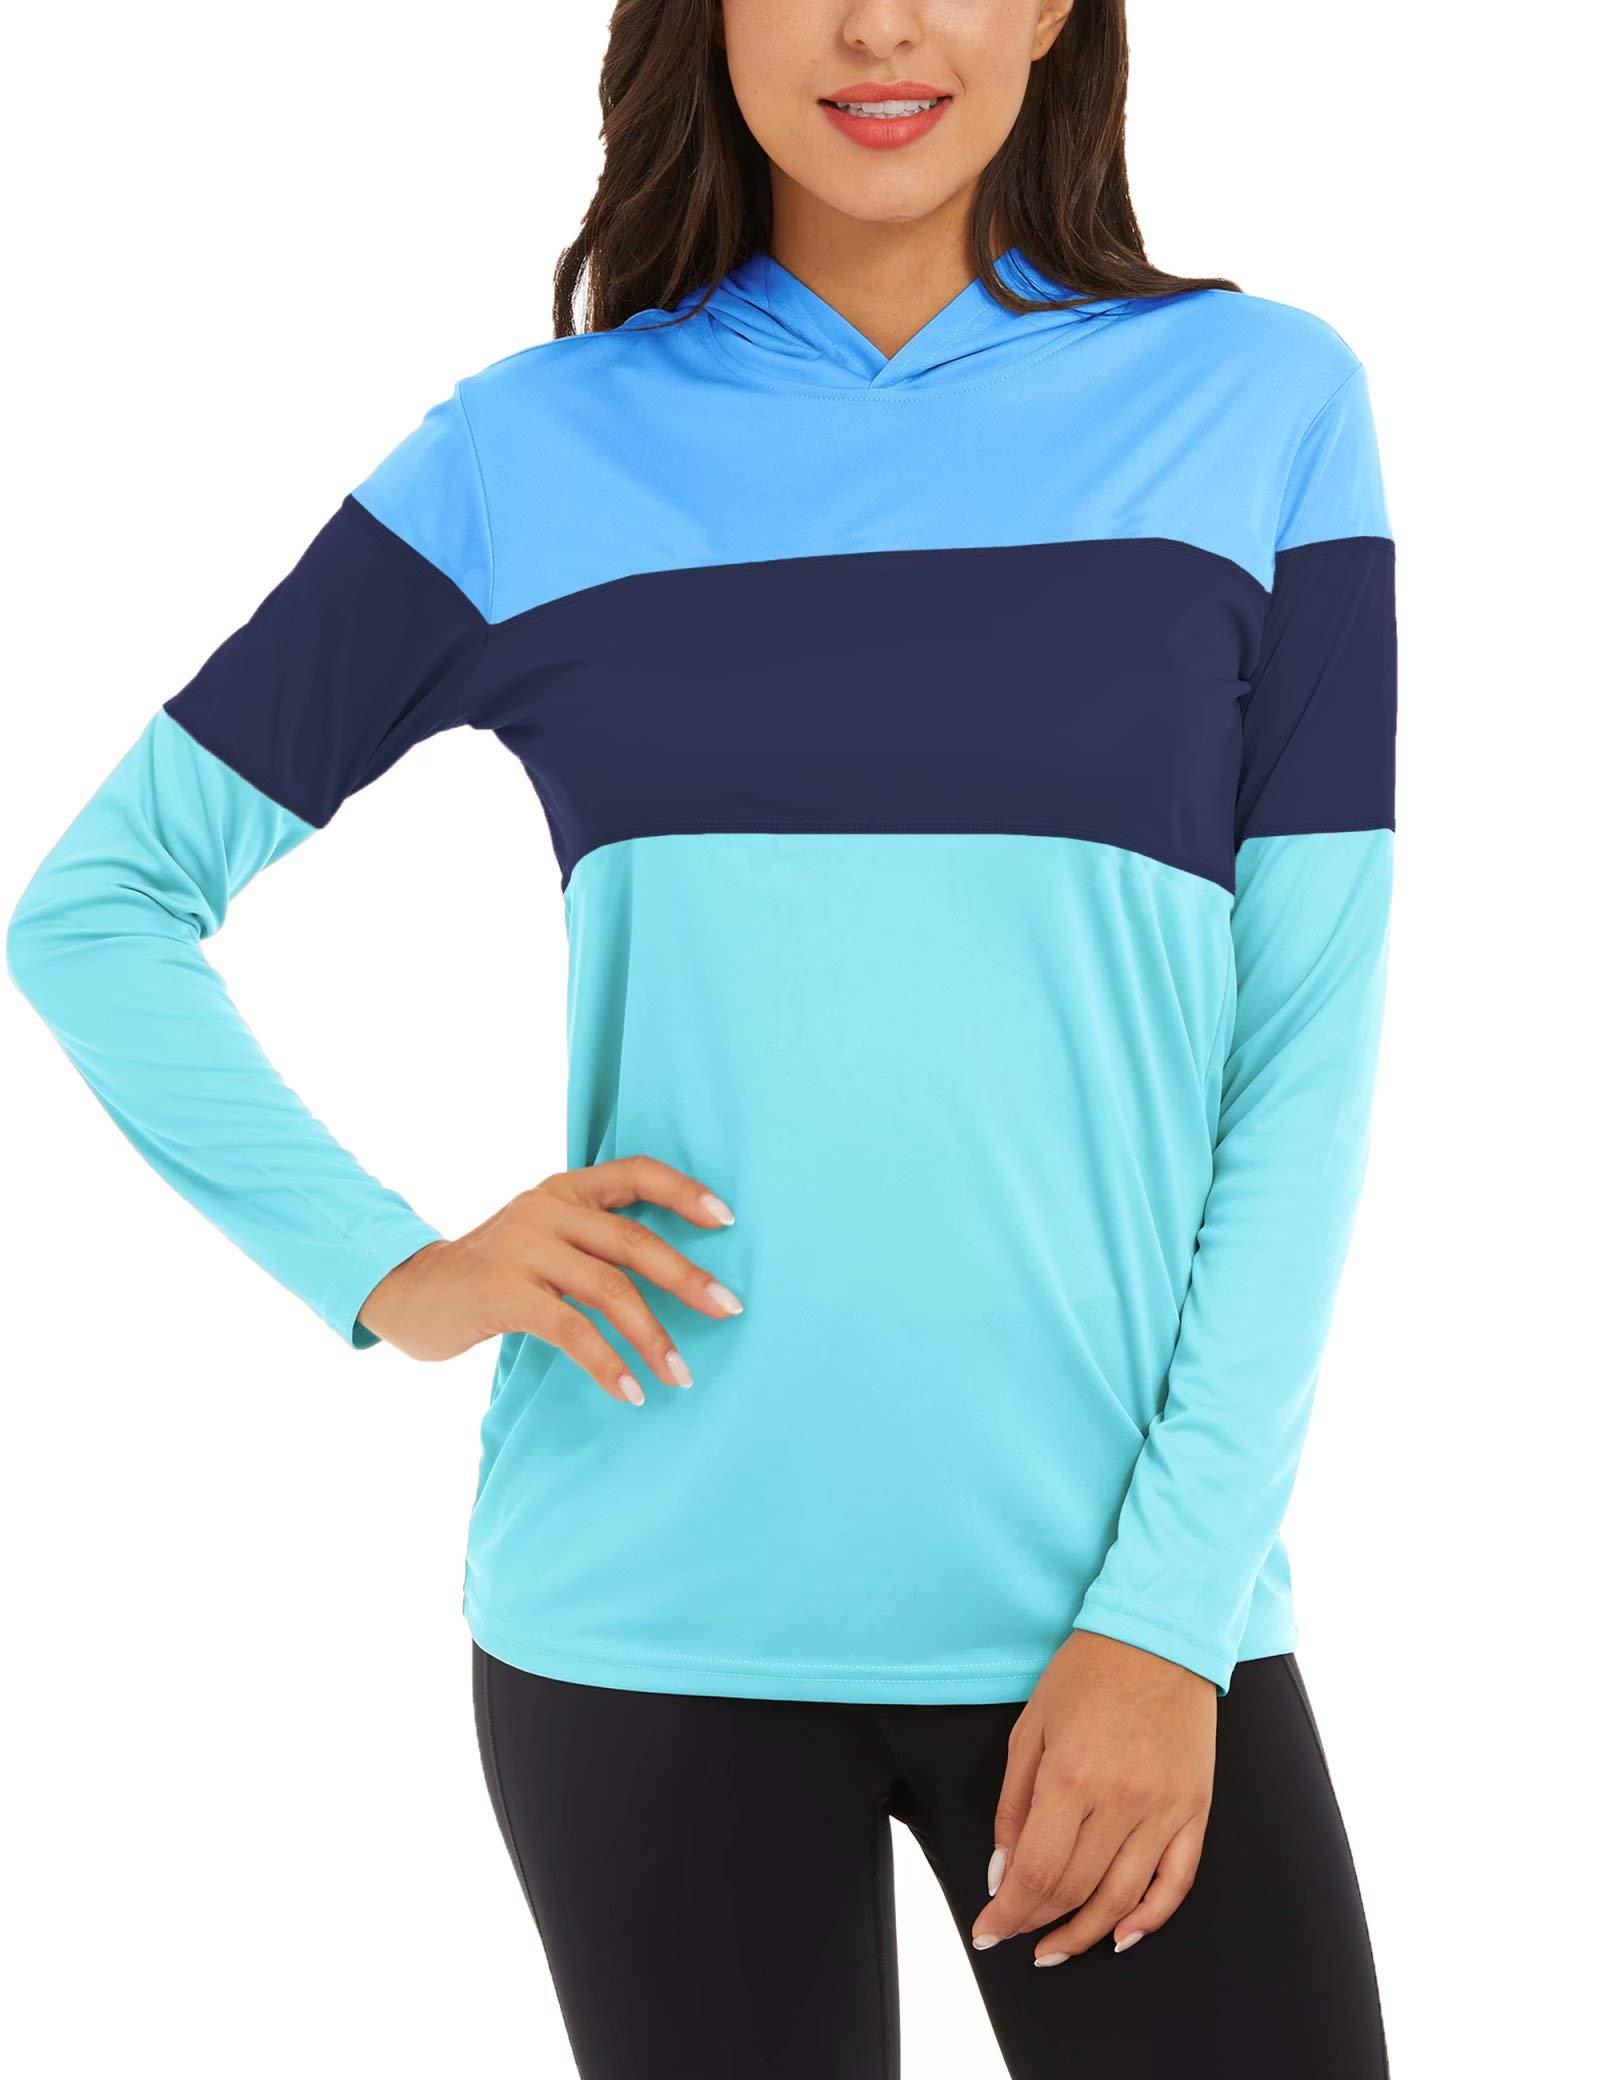 MAGCOMSEN Women's UPF 50+ UV Sun Protection T Shirts Long Sleeve Dri Fit Hoodie Performance Workout Running Shirts